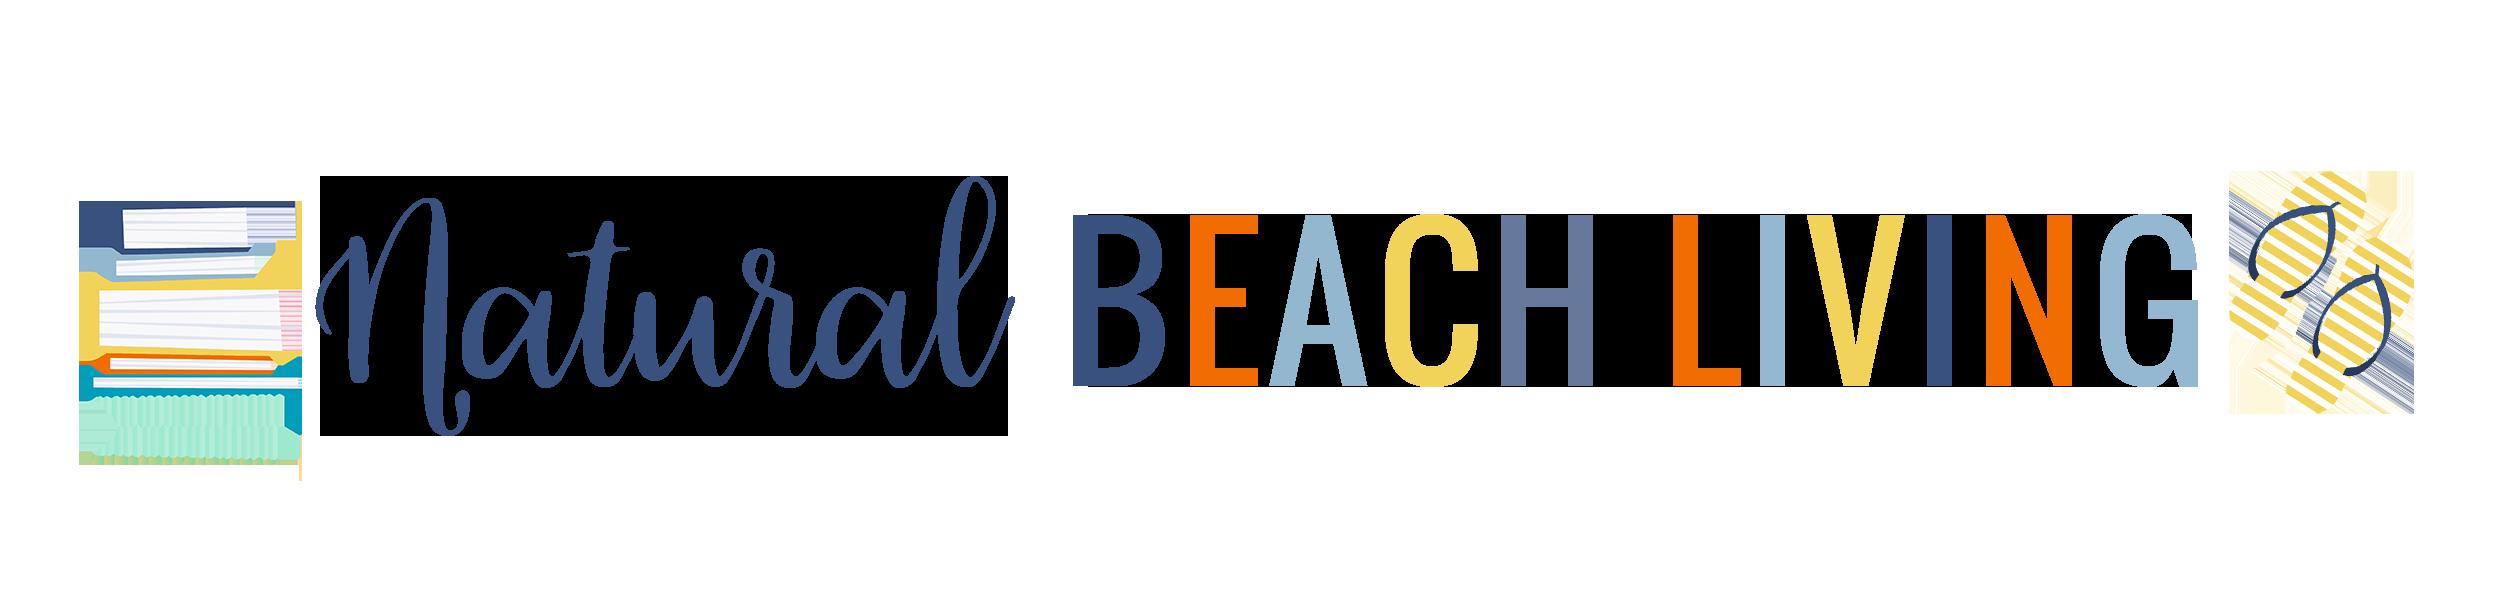 Natural Beach Living